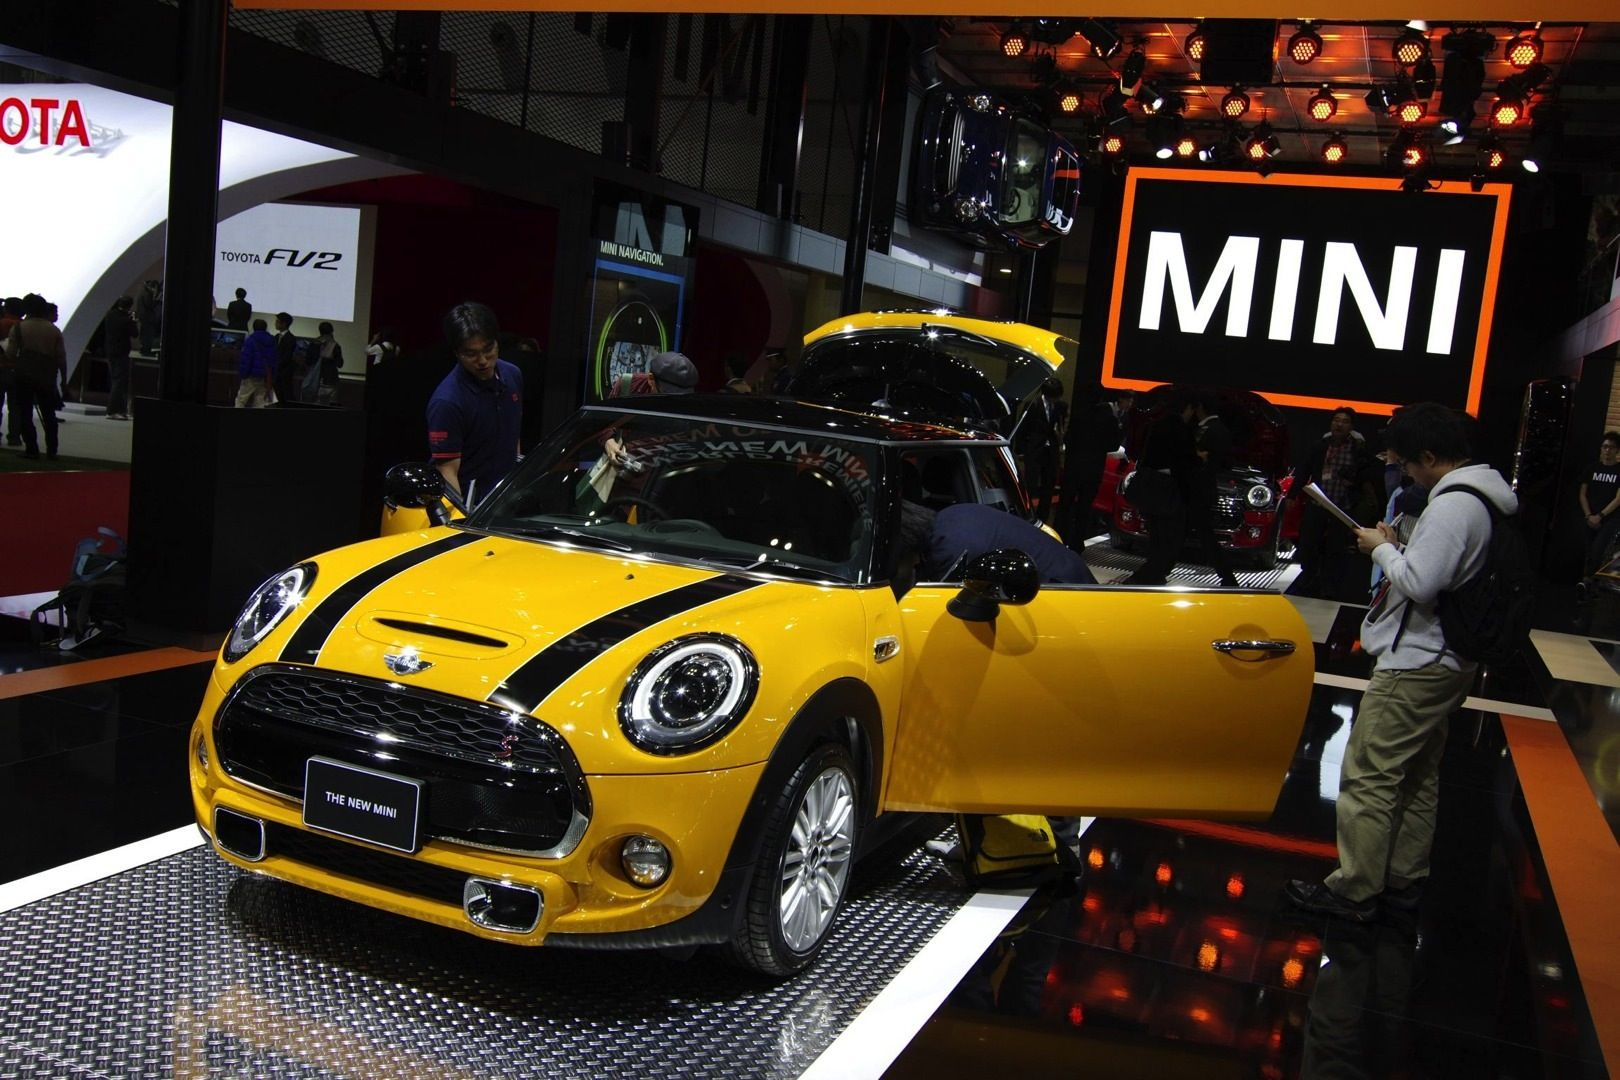 Mini Cooper Car >> Tokyo Motor Show 2017